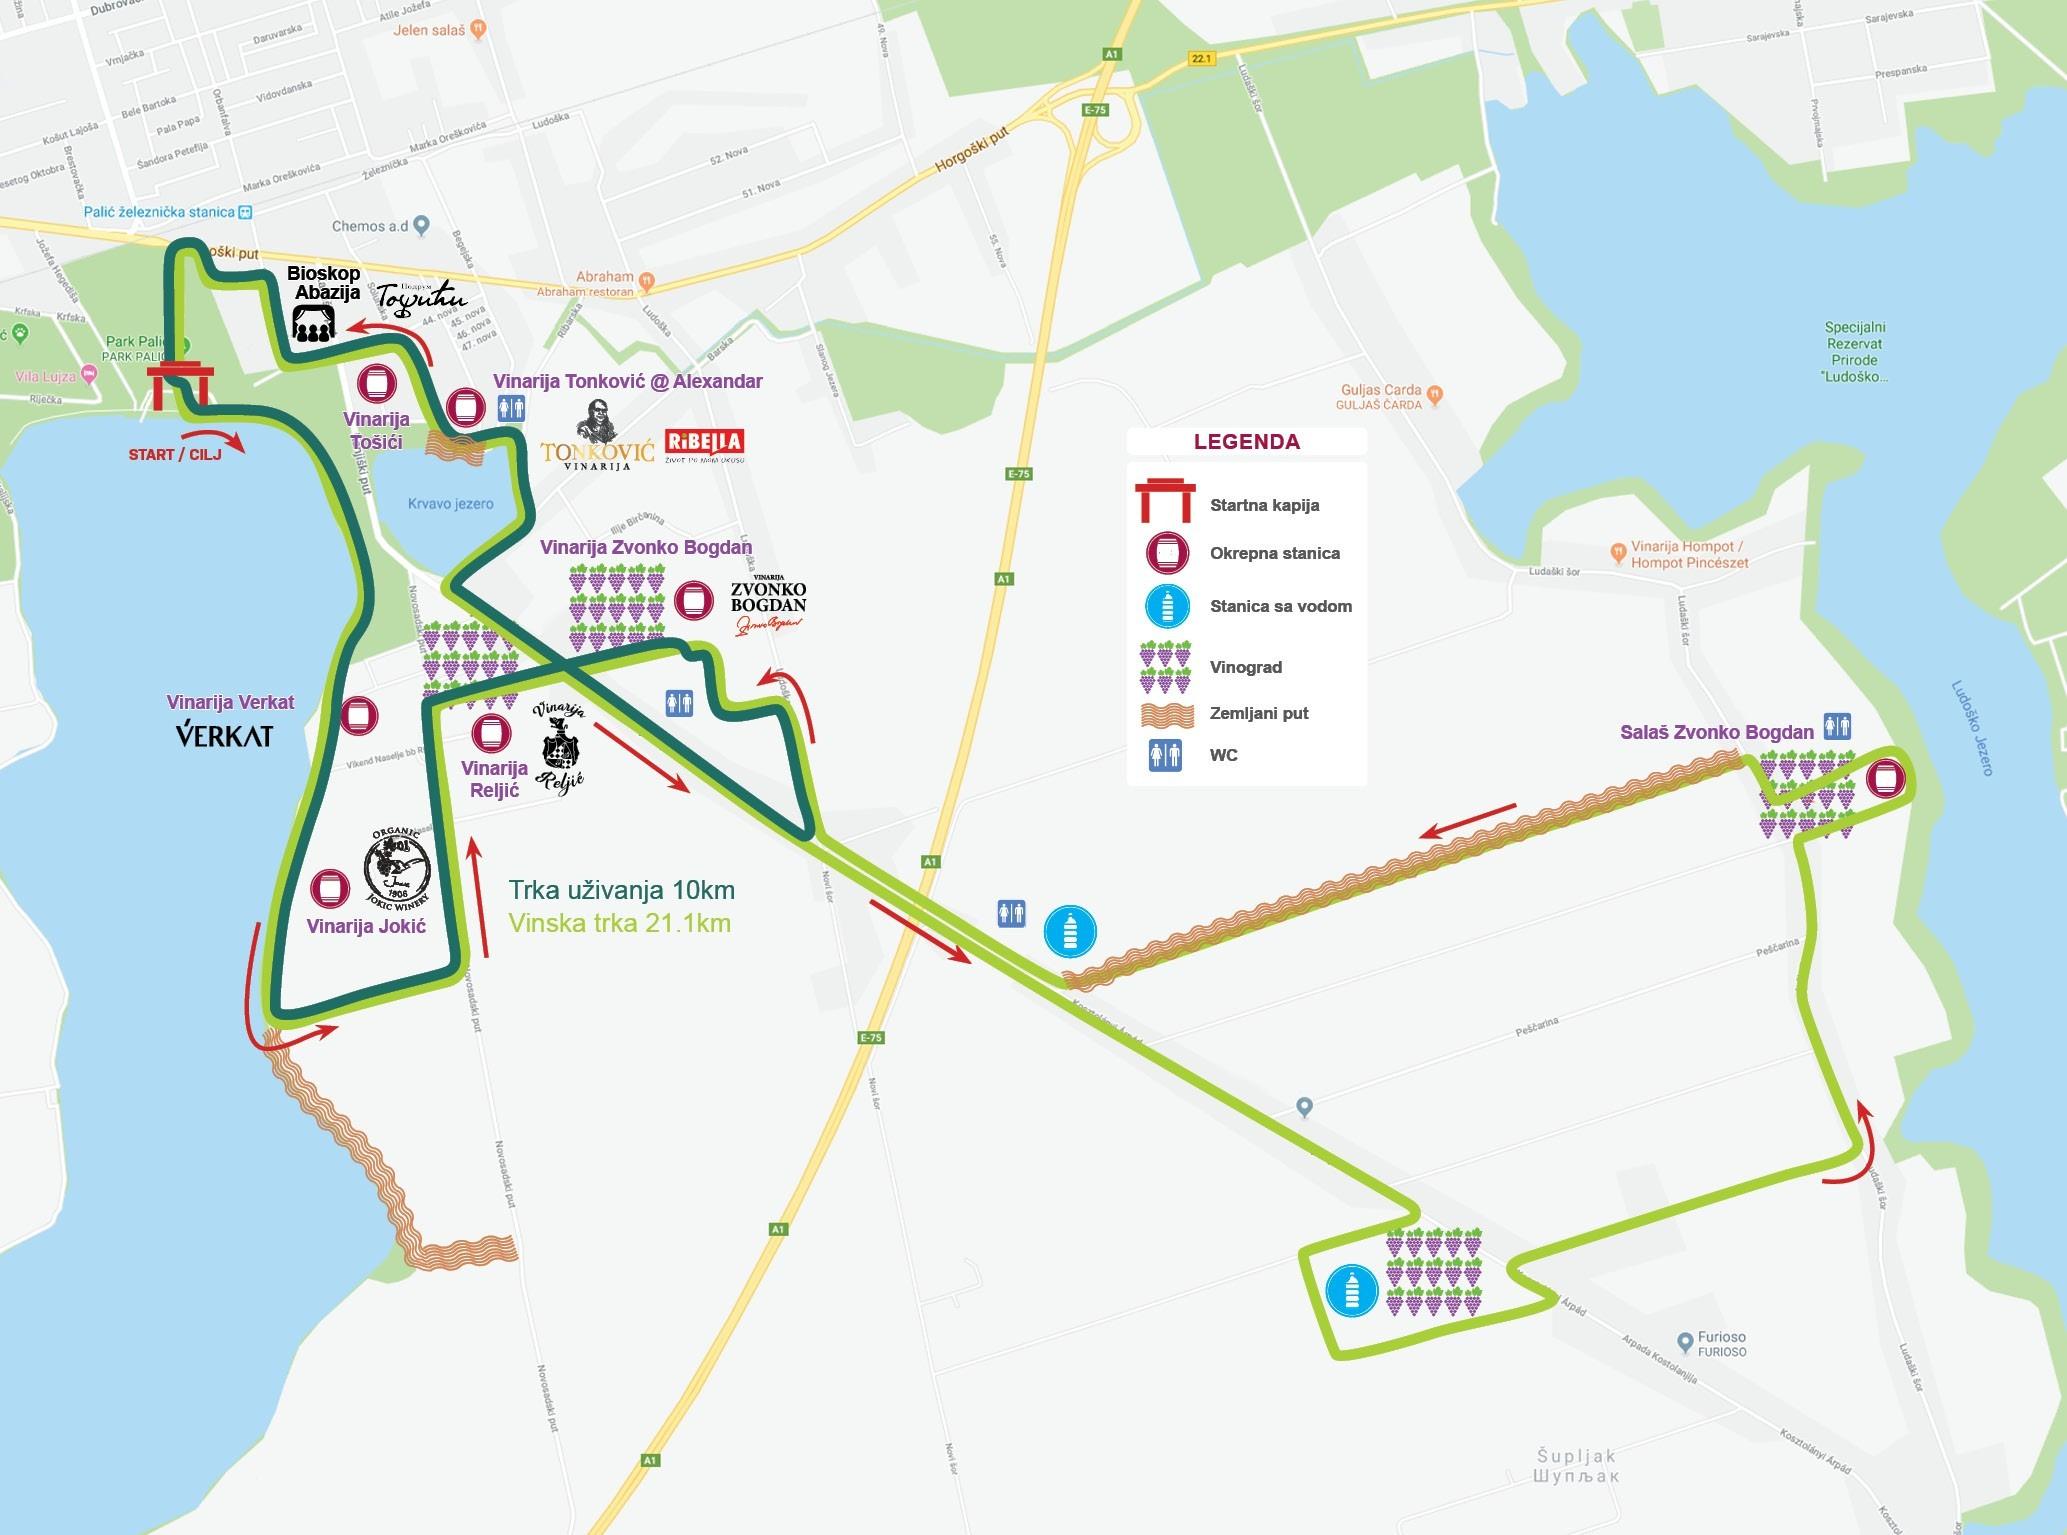 Mapa Vinski Maraton Palic Subotica